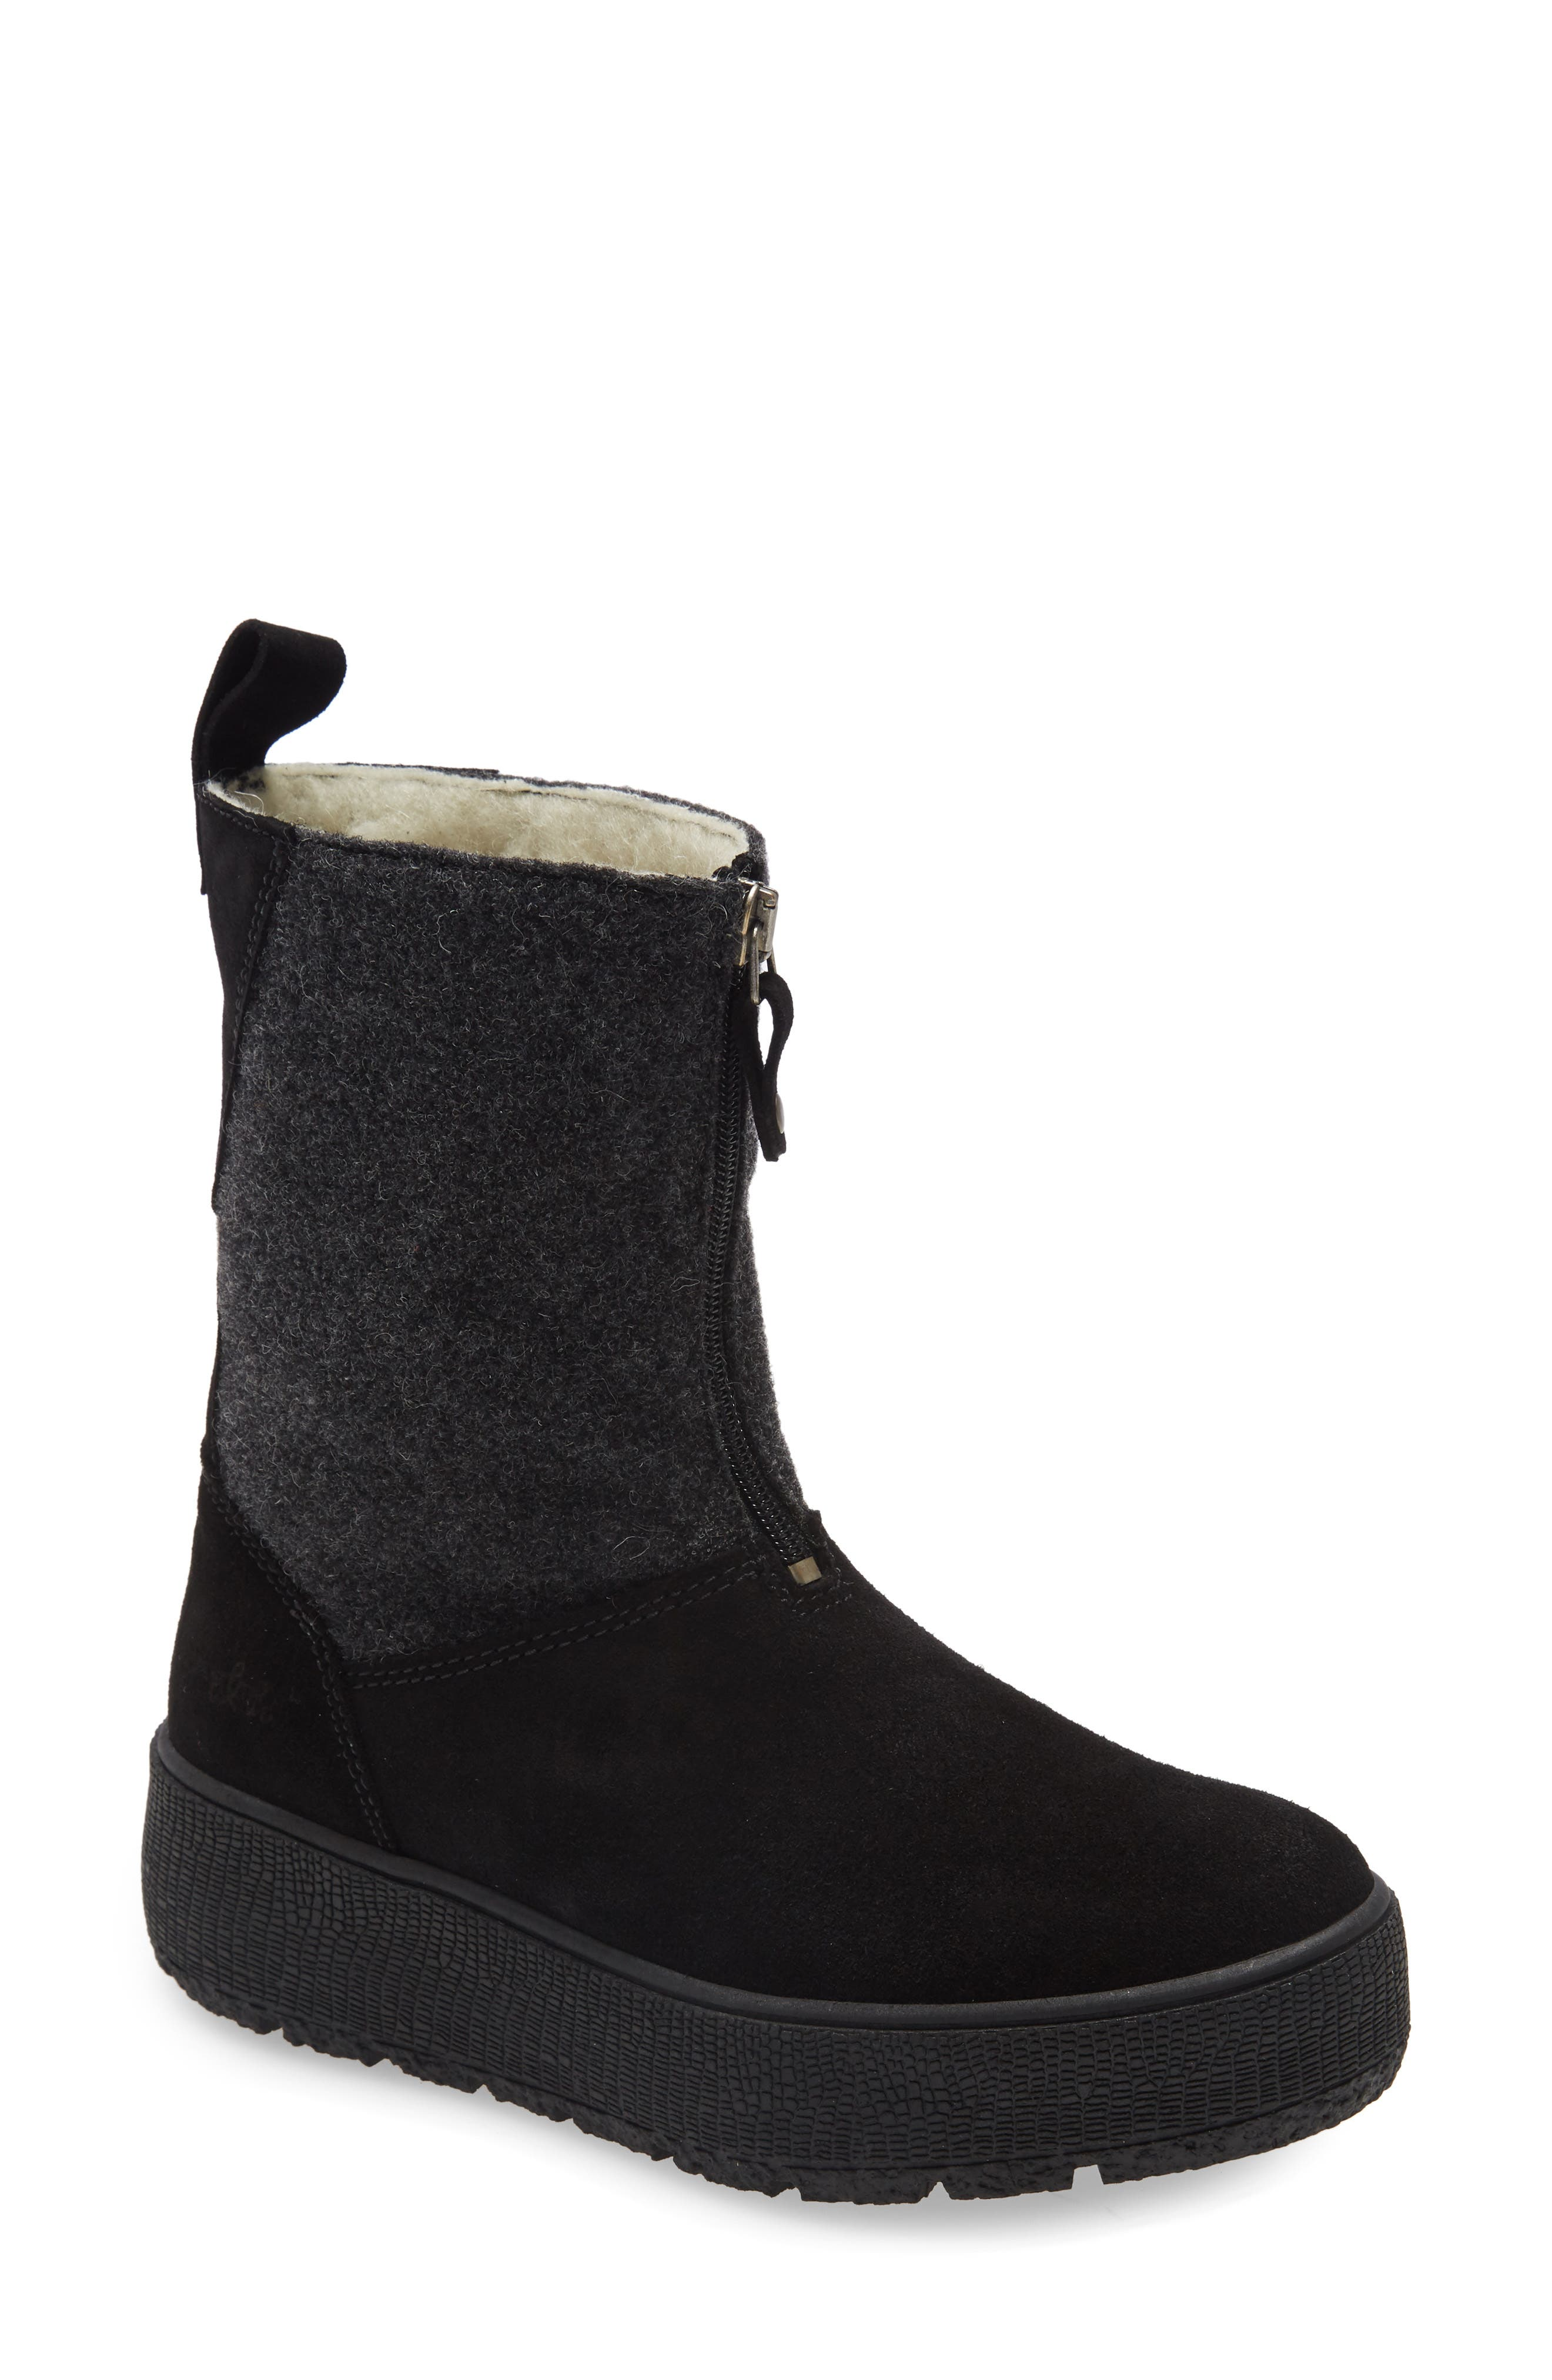 Ignite Waterproof Winter Boot